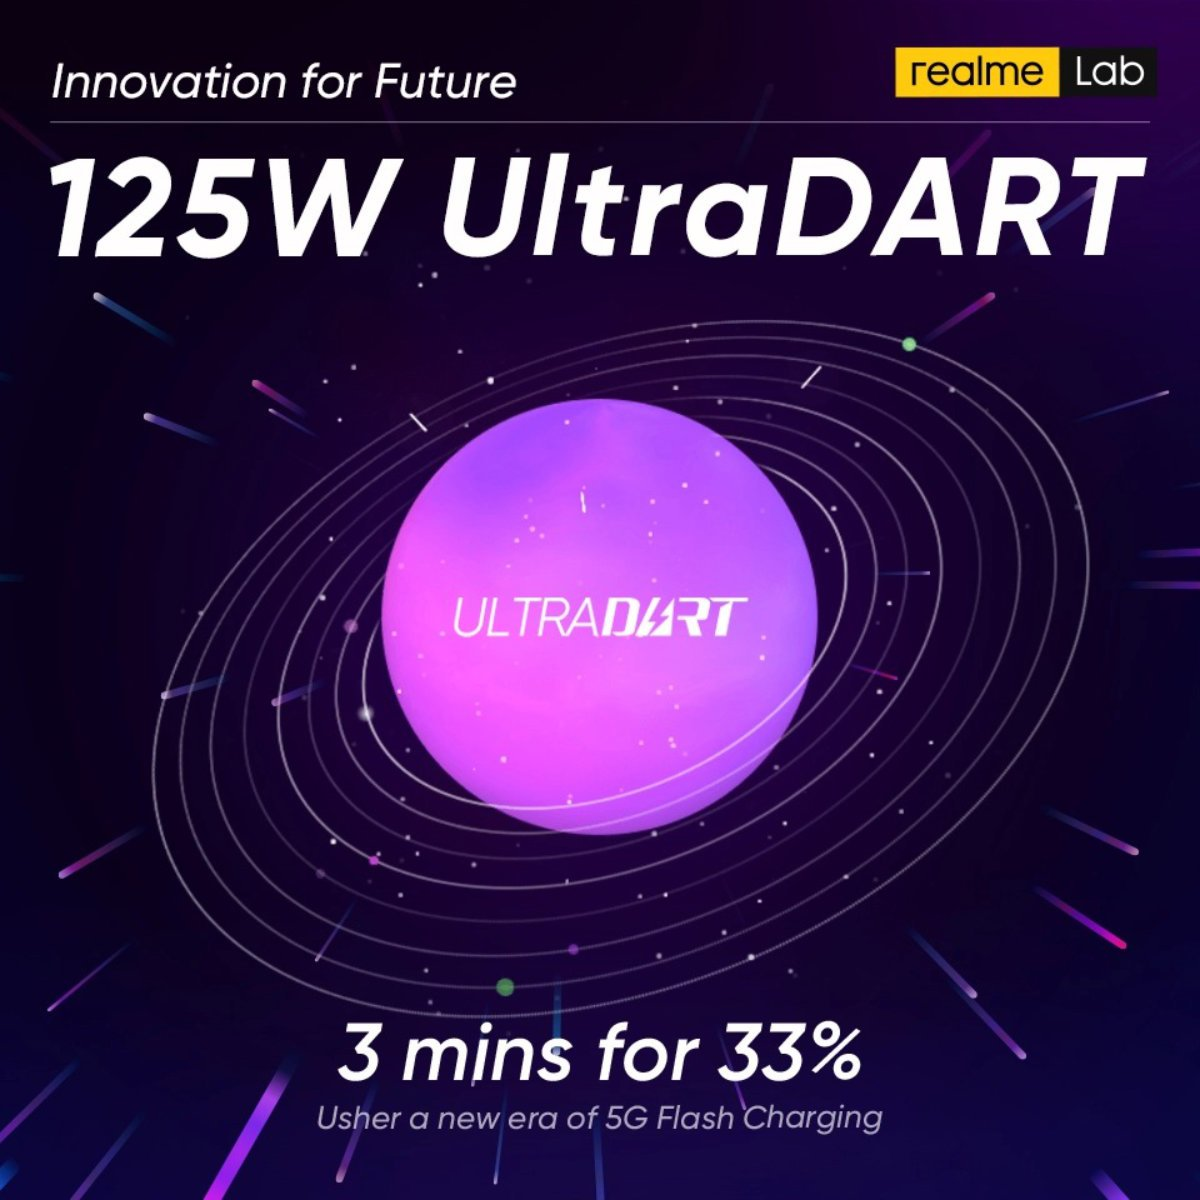 Realme passe aussi au 125 W avec sa charge rapide UltraDART